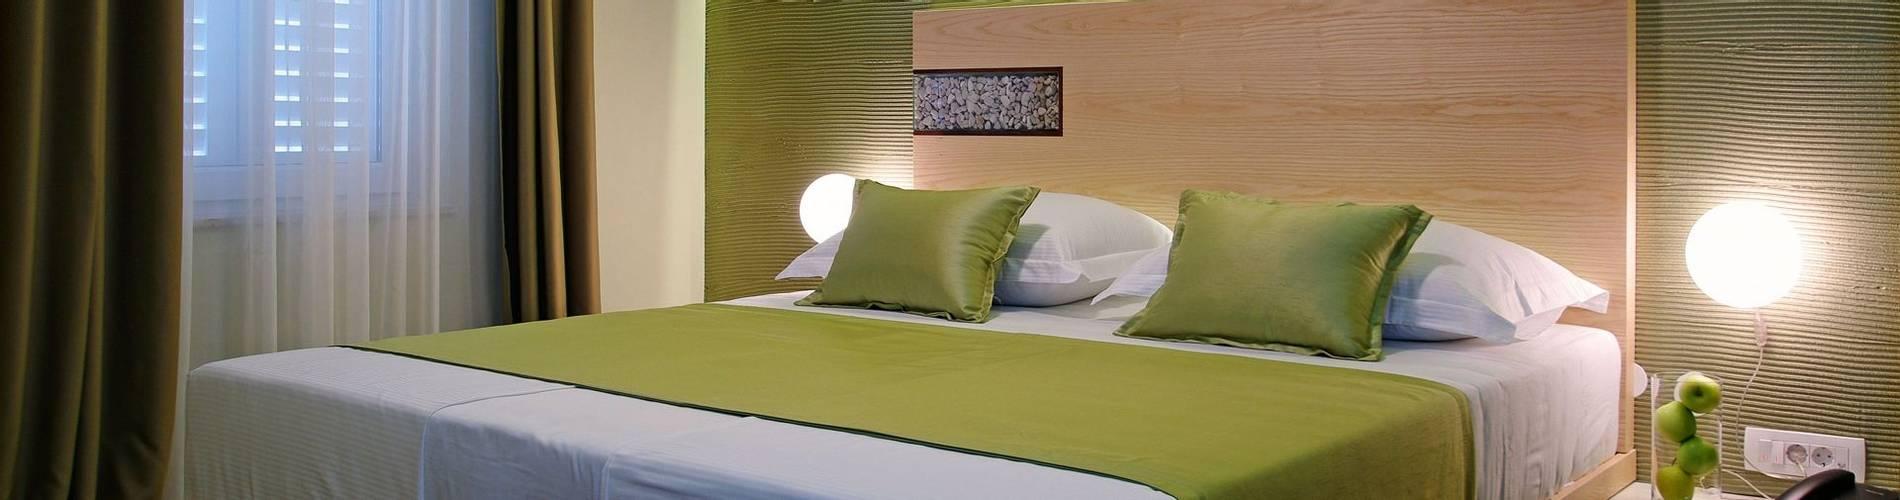 Hotel Bol, Central Dalmatia, Croatia, Deluxe SV.jpg